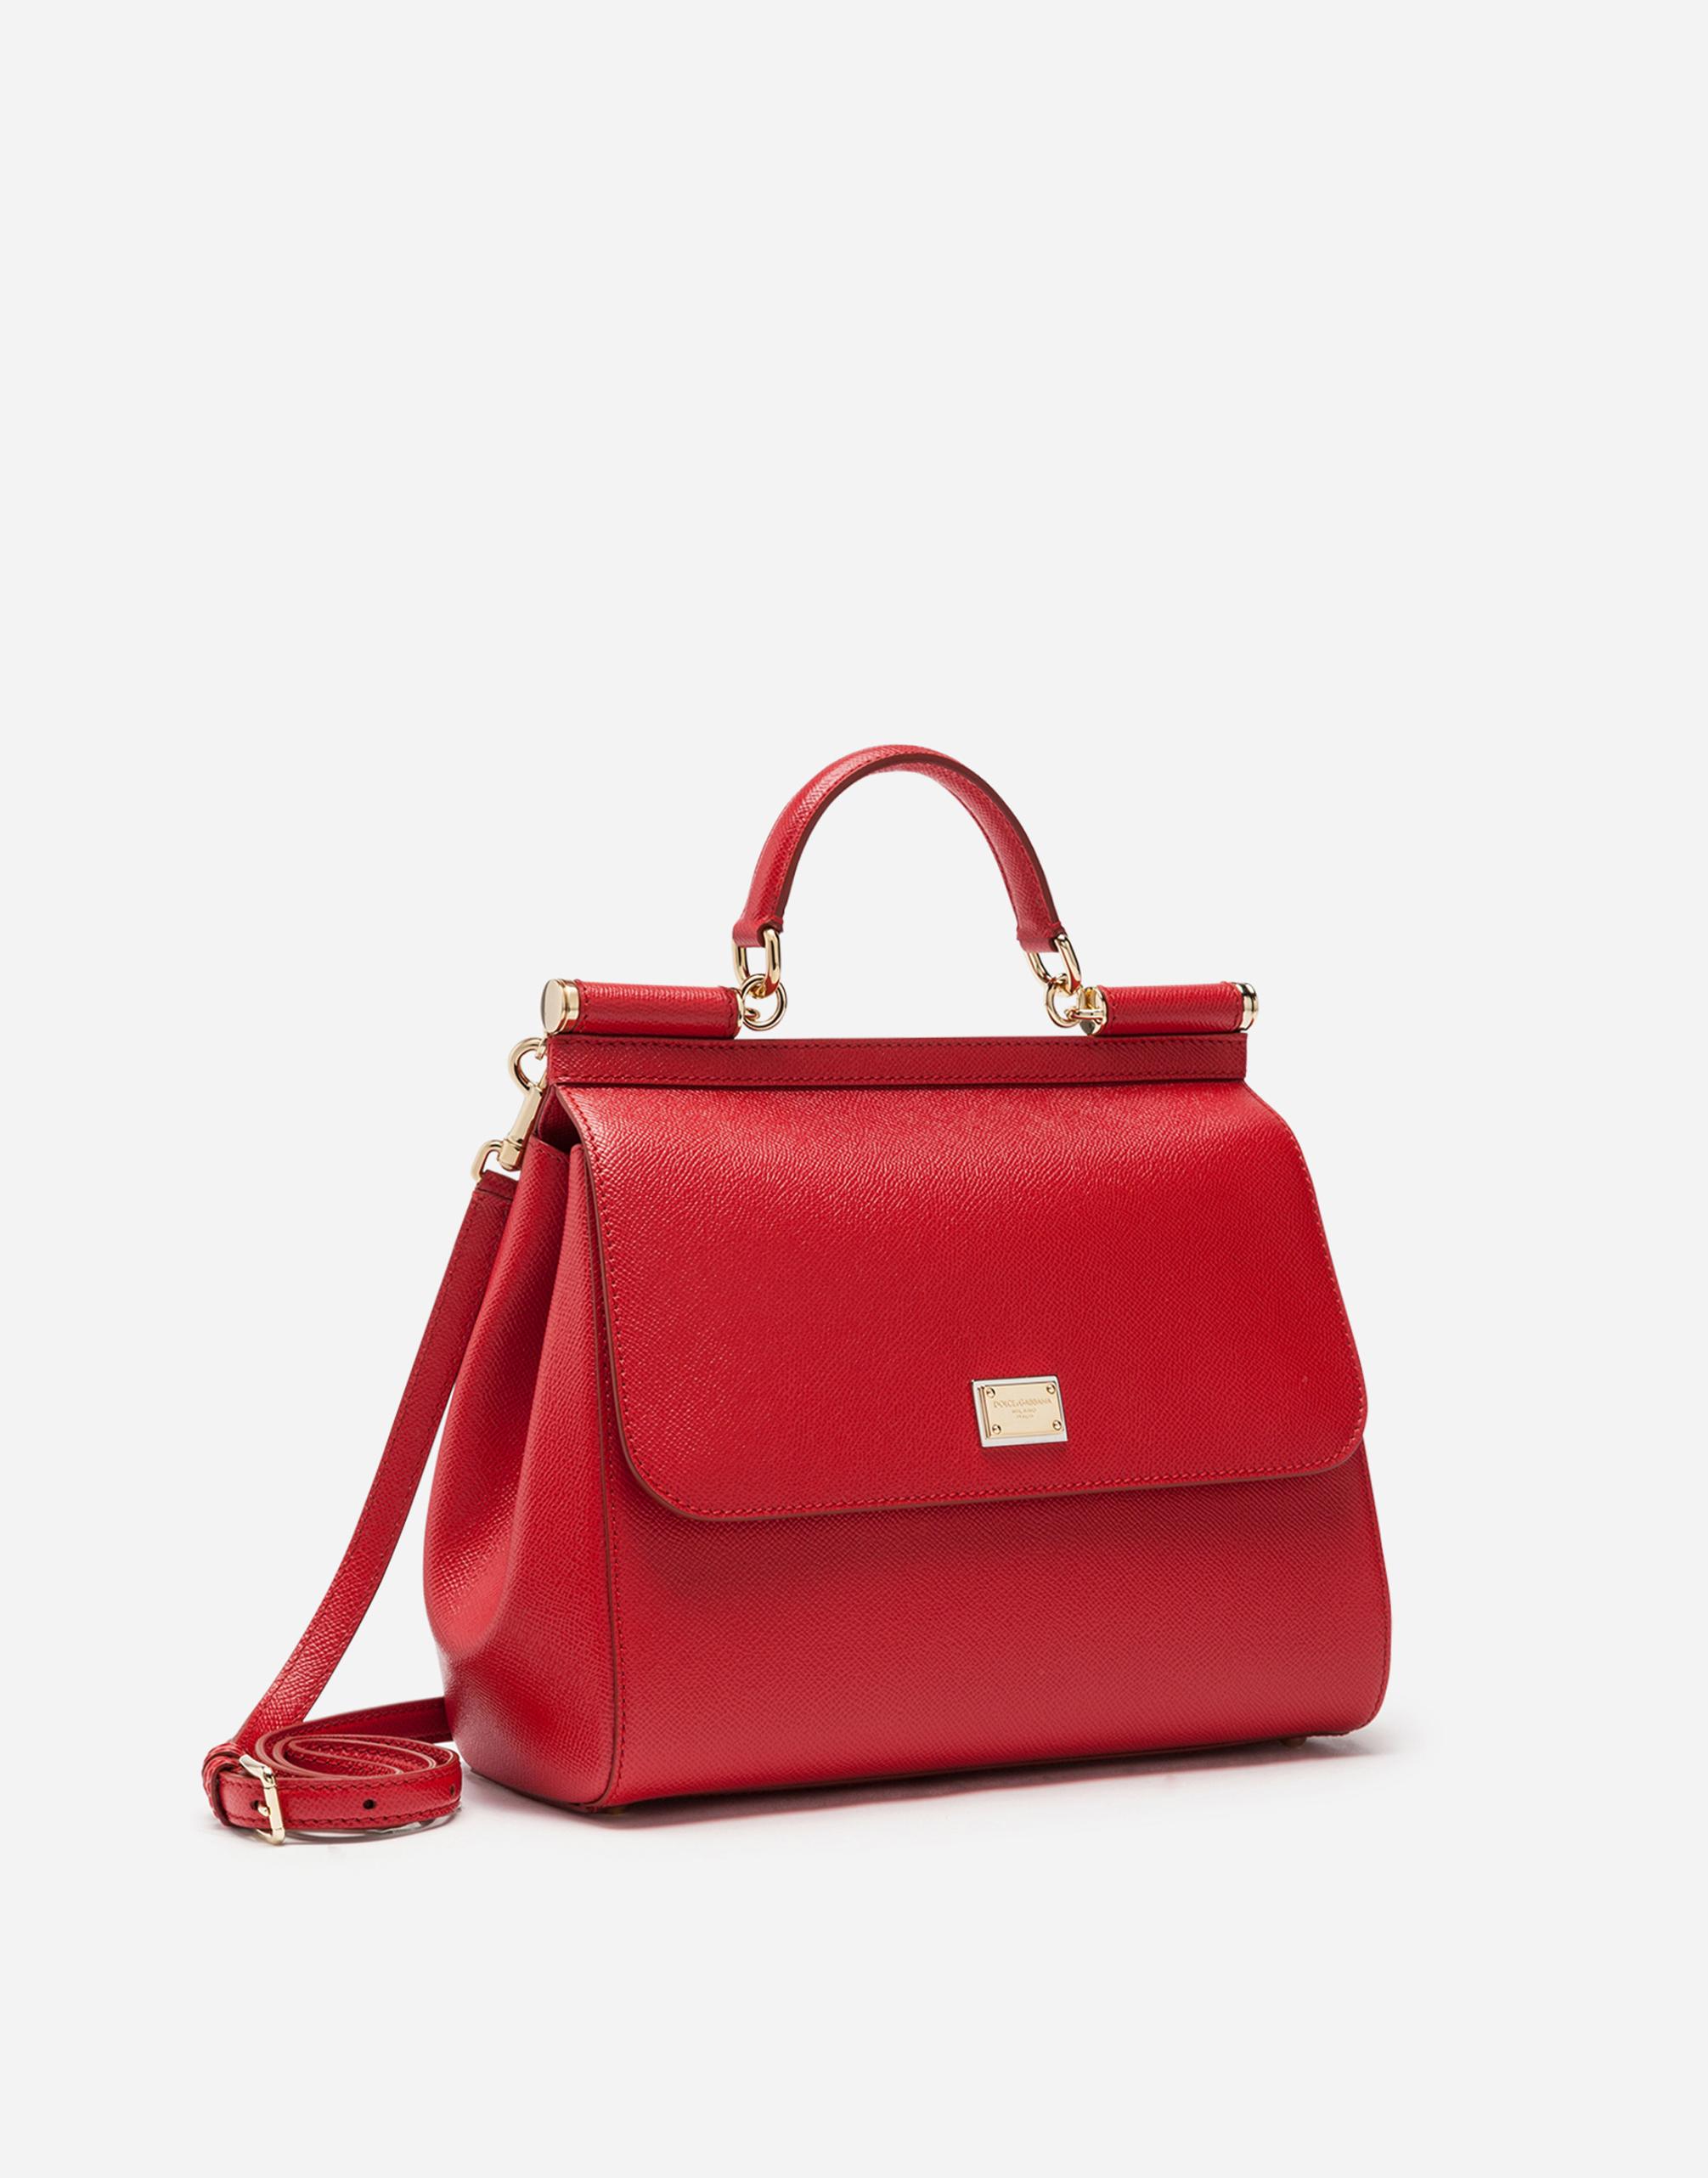 Dolce&Gabbana DAUPHINE LEATHER REGULAR SICILY BAG